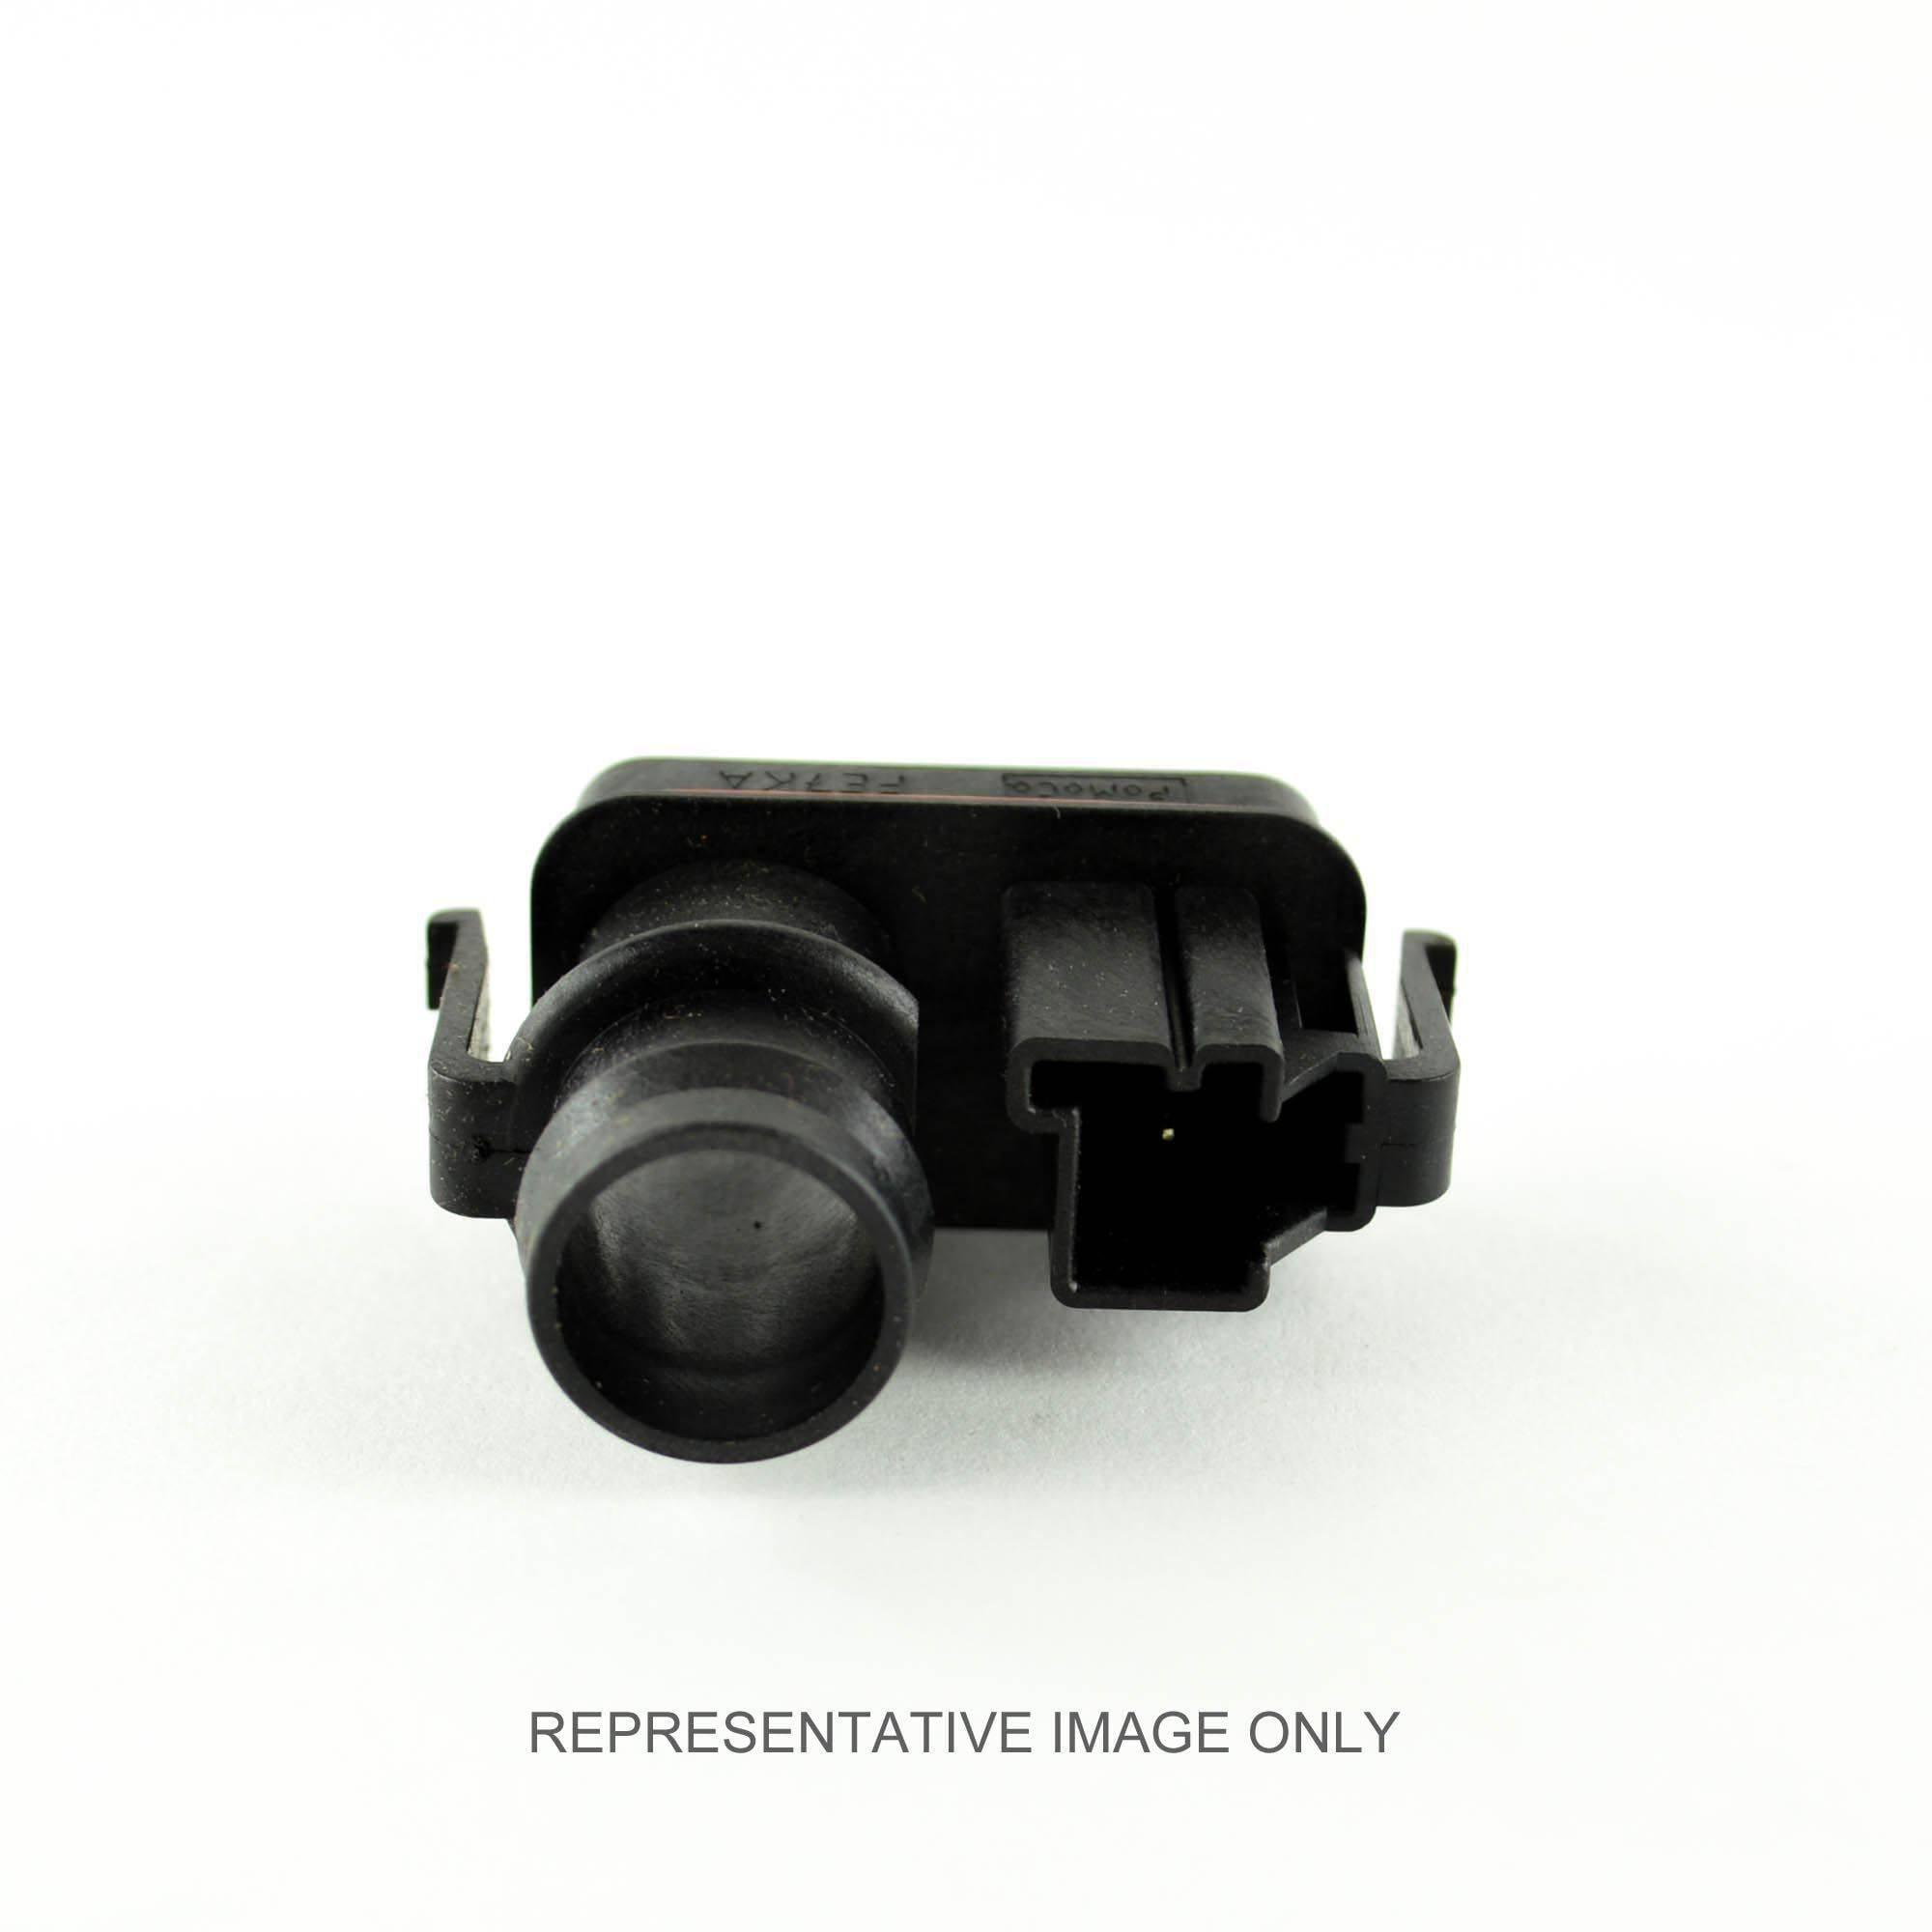 Motorcraft Ambient Temp Switch, MTCH1663